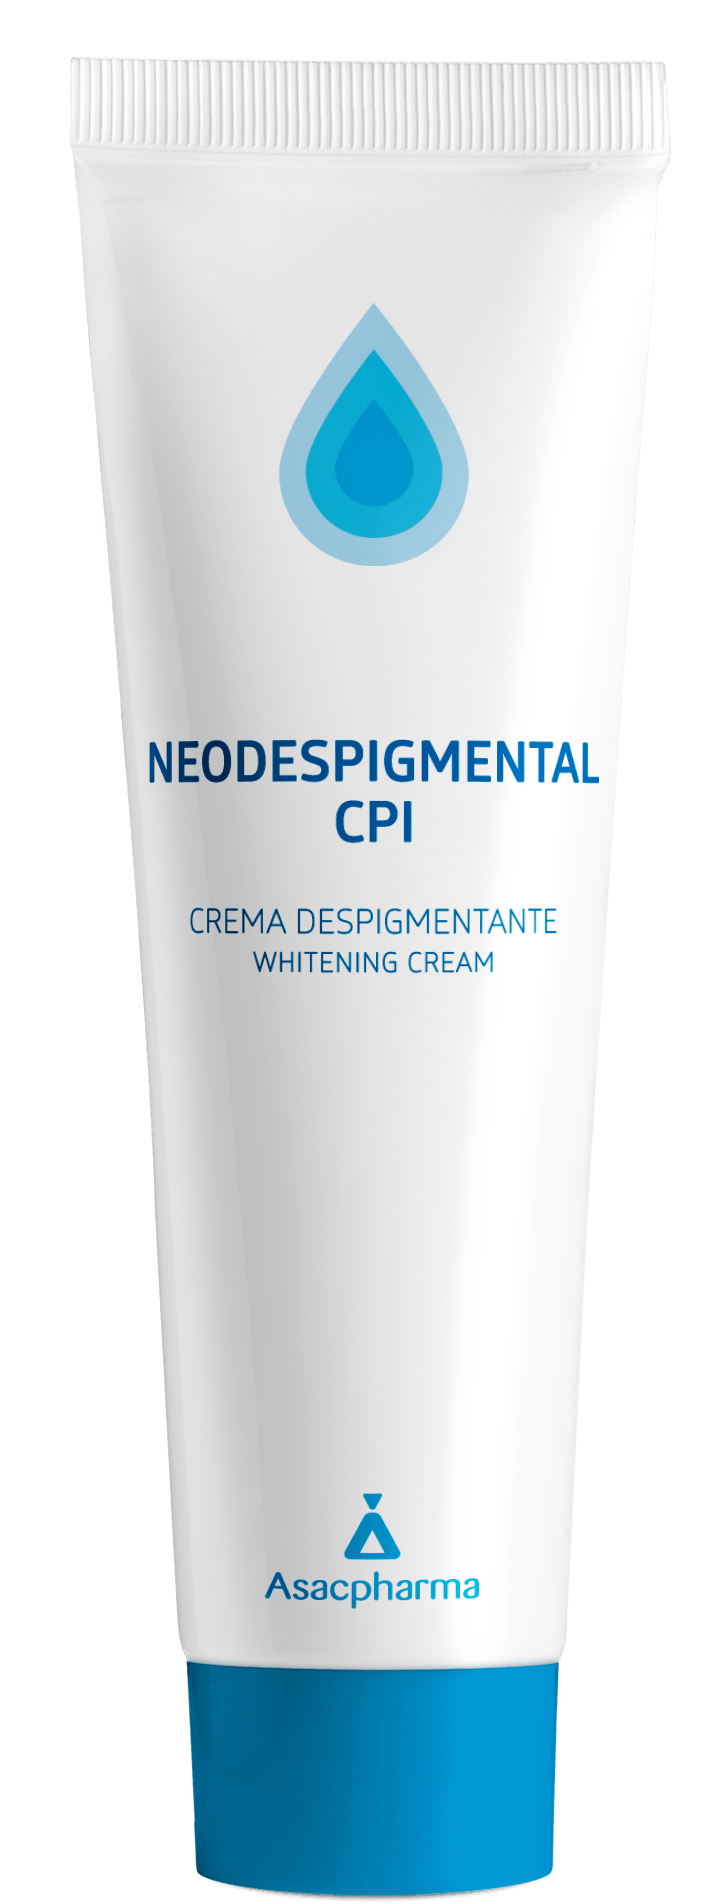 Neodespigmental